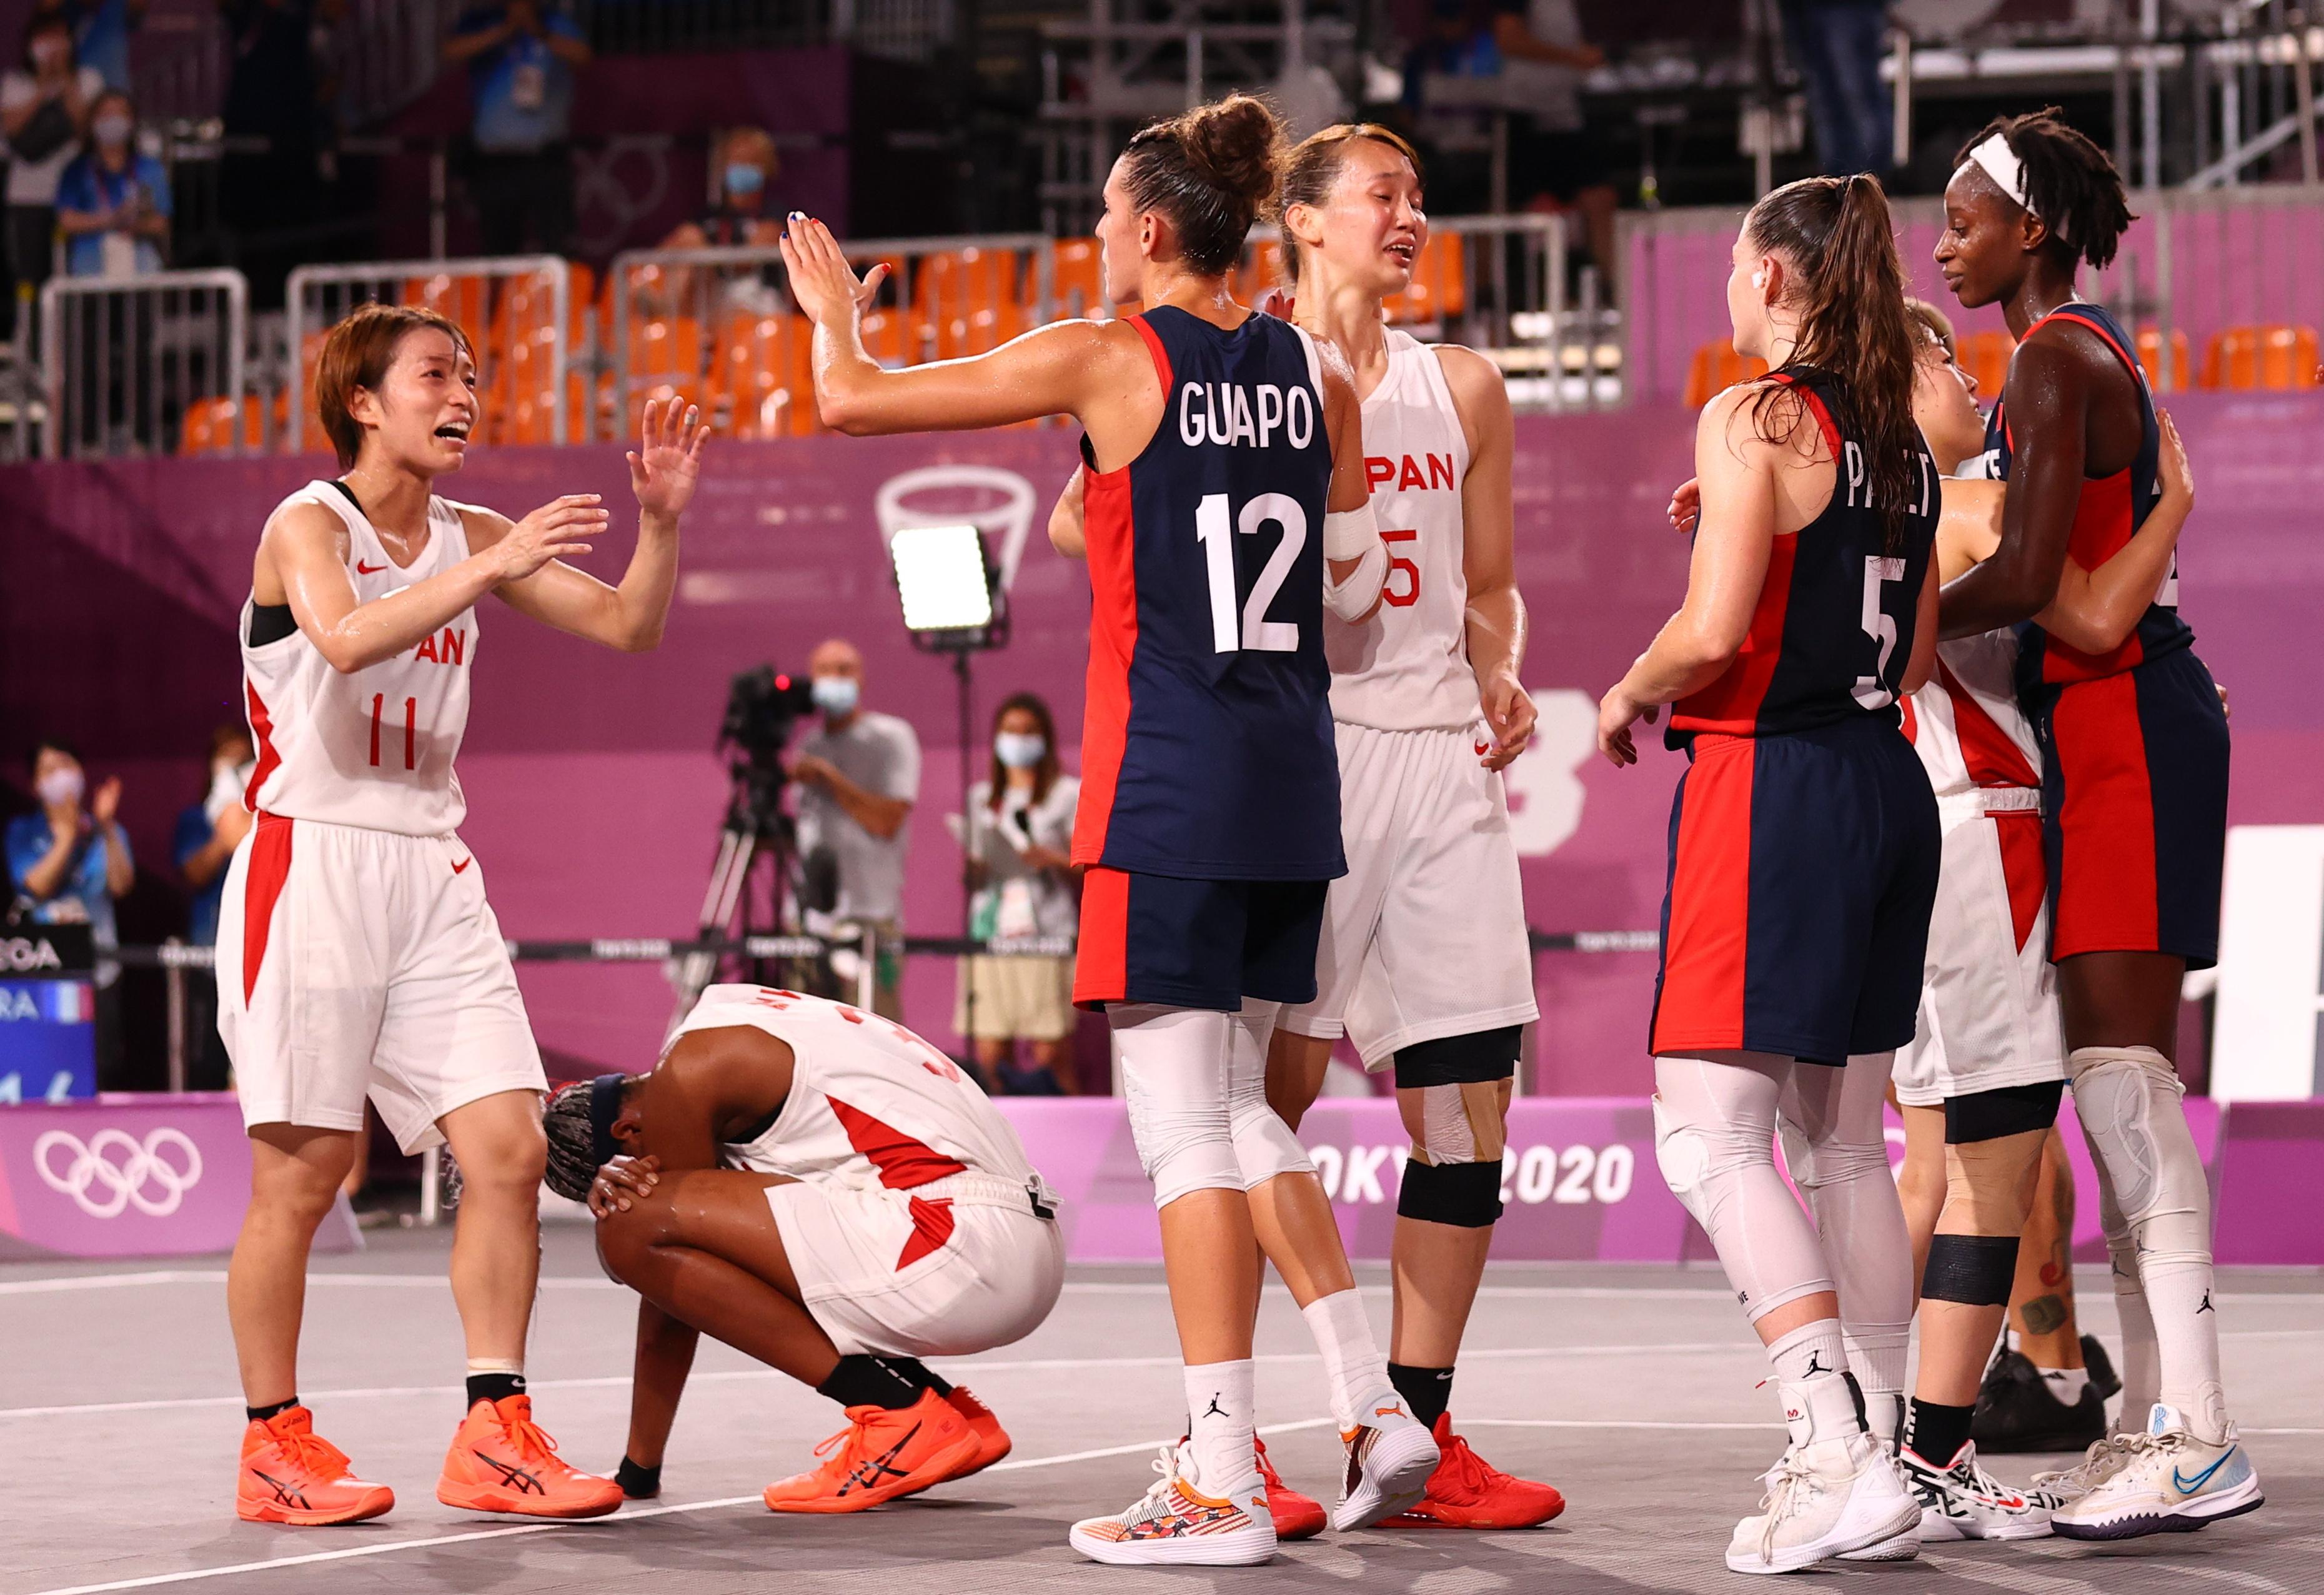 Tokyo 2020 Olympics - Basketball 3x3 - Women - Quarterfinal - Japan v France - Aomi Urban Sports Park, Tokyo Japan - July 27, 2021. Players of Japan greet players of France after the match. REUTERS/Andrew Boyers